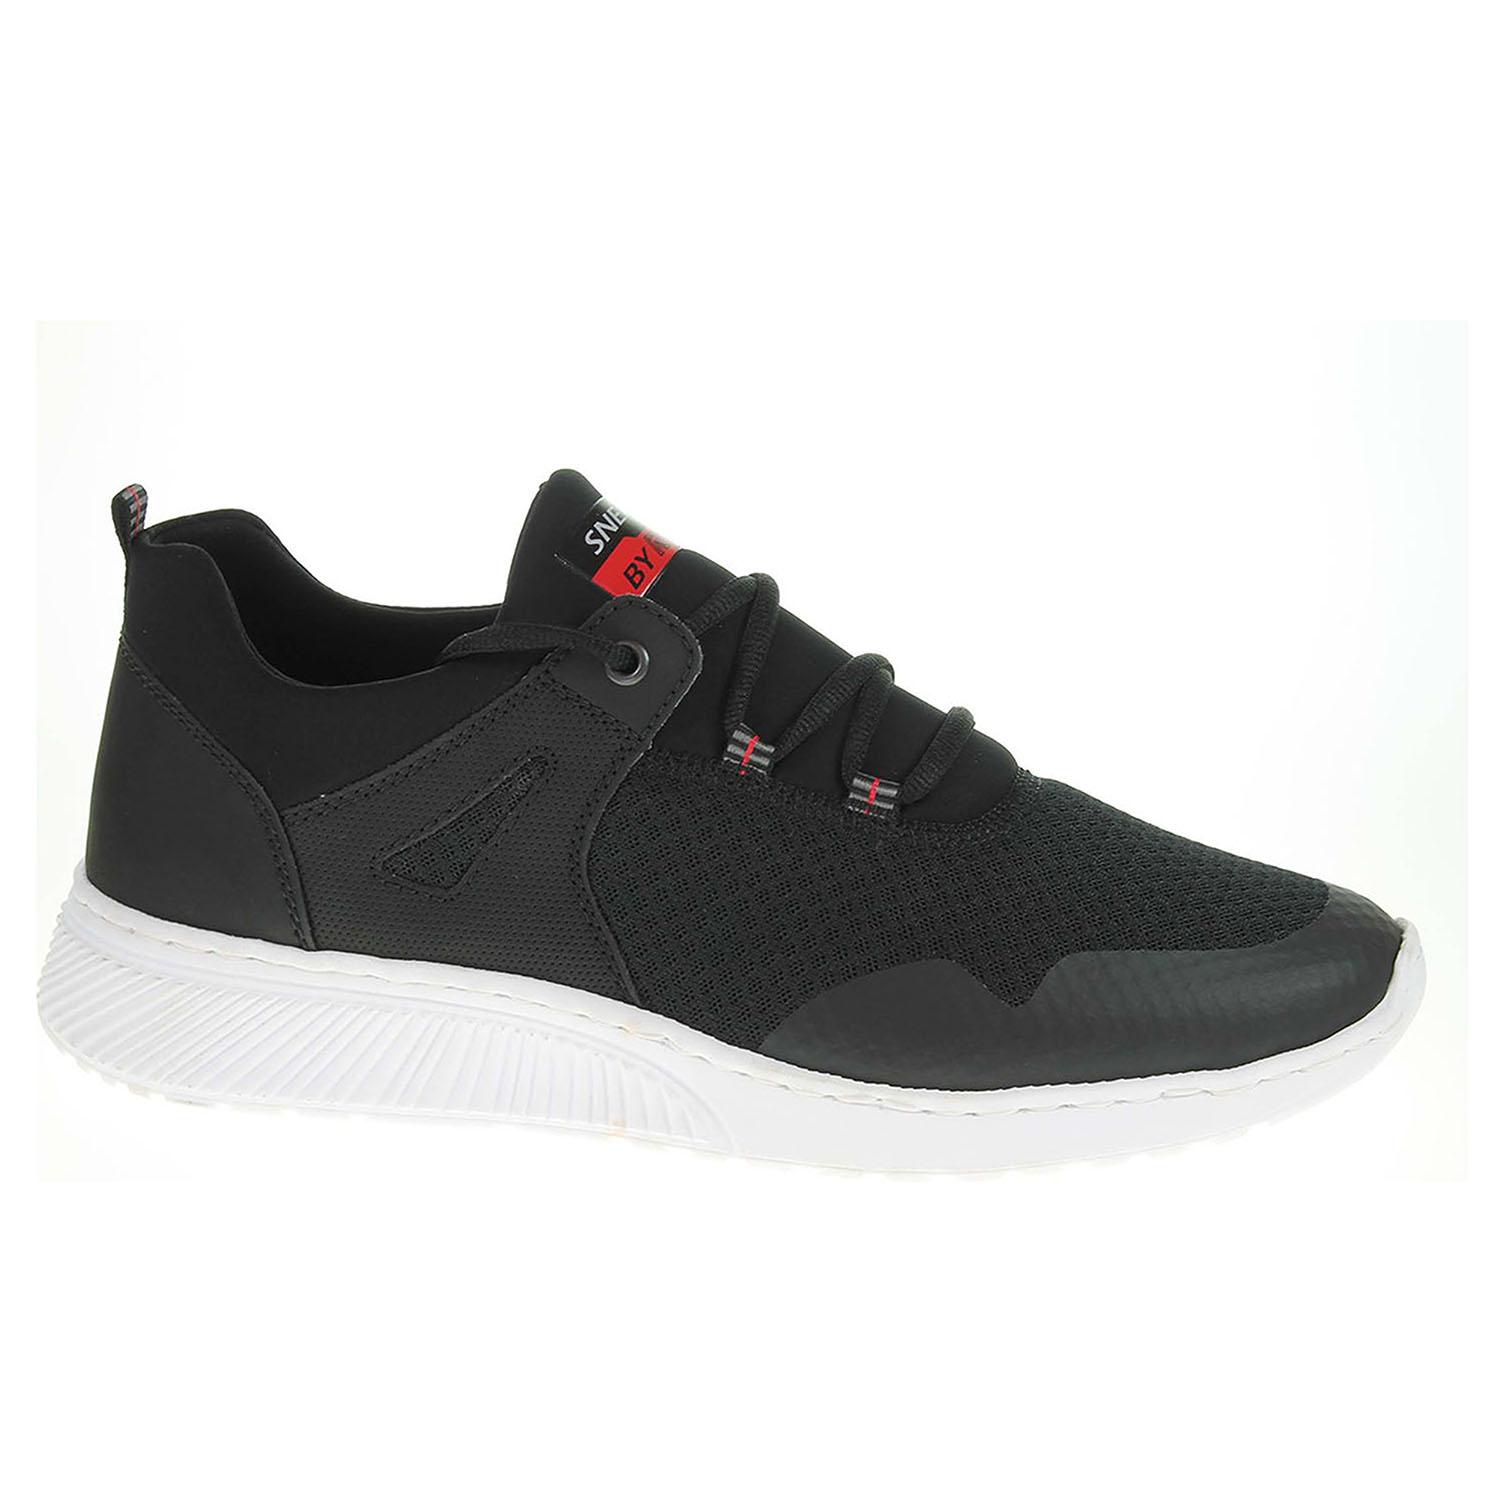 Pánská obuv Rieker B5050-00 schwarz B5050-00 41